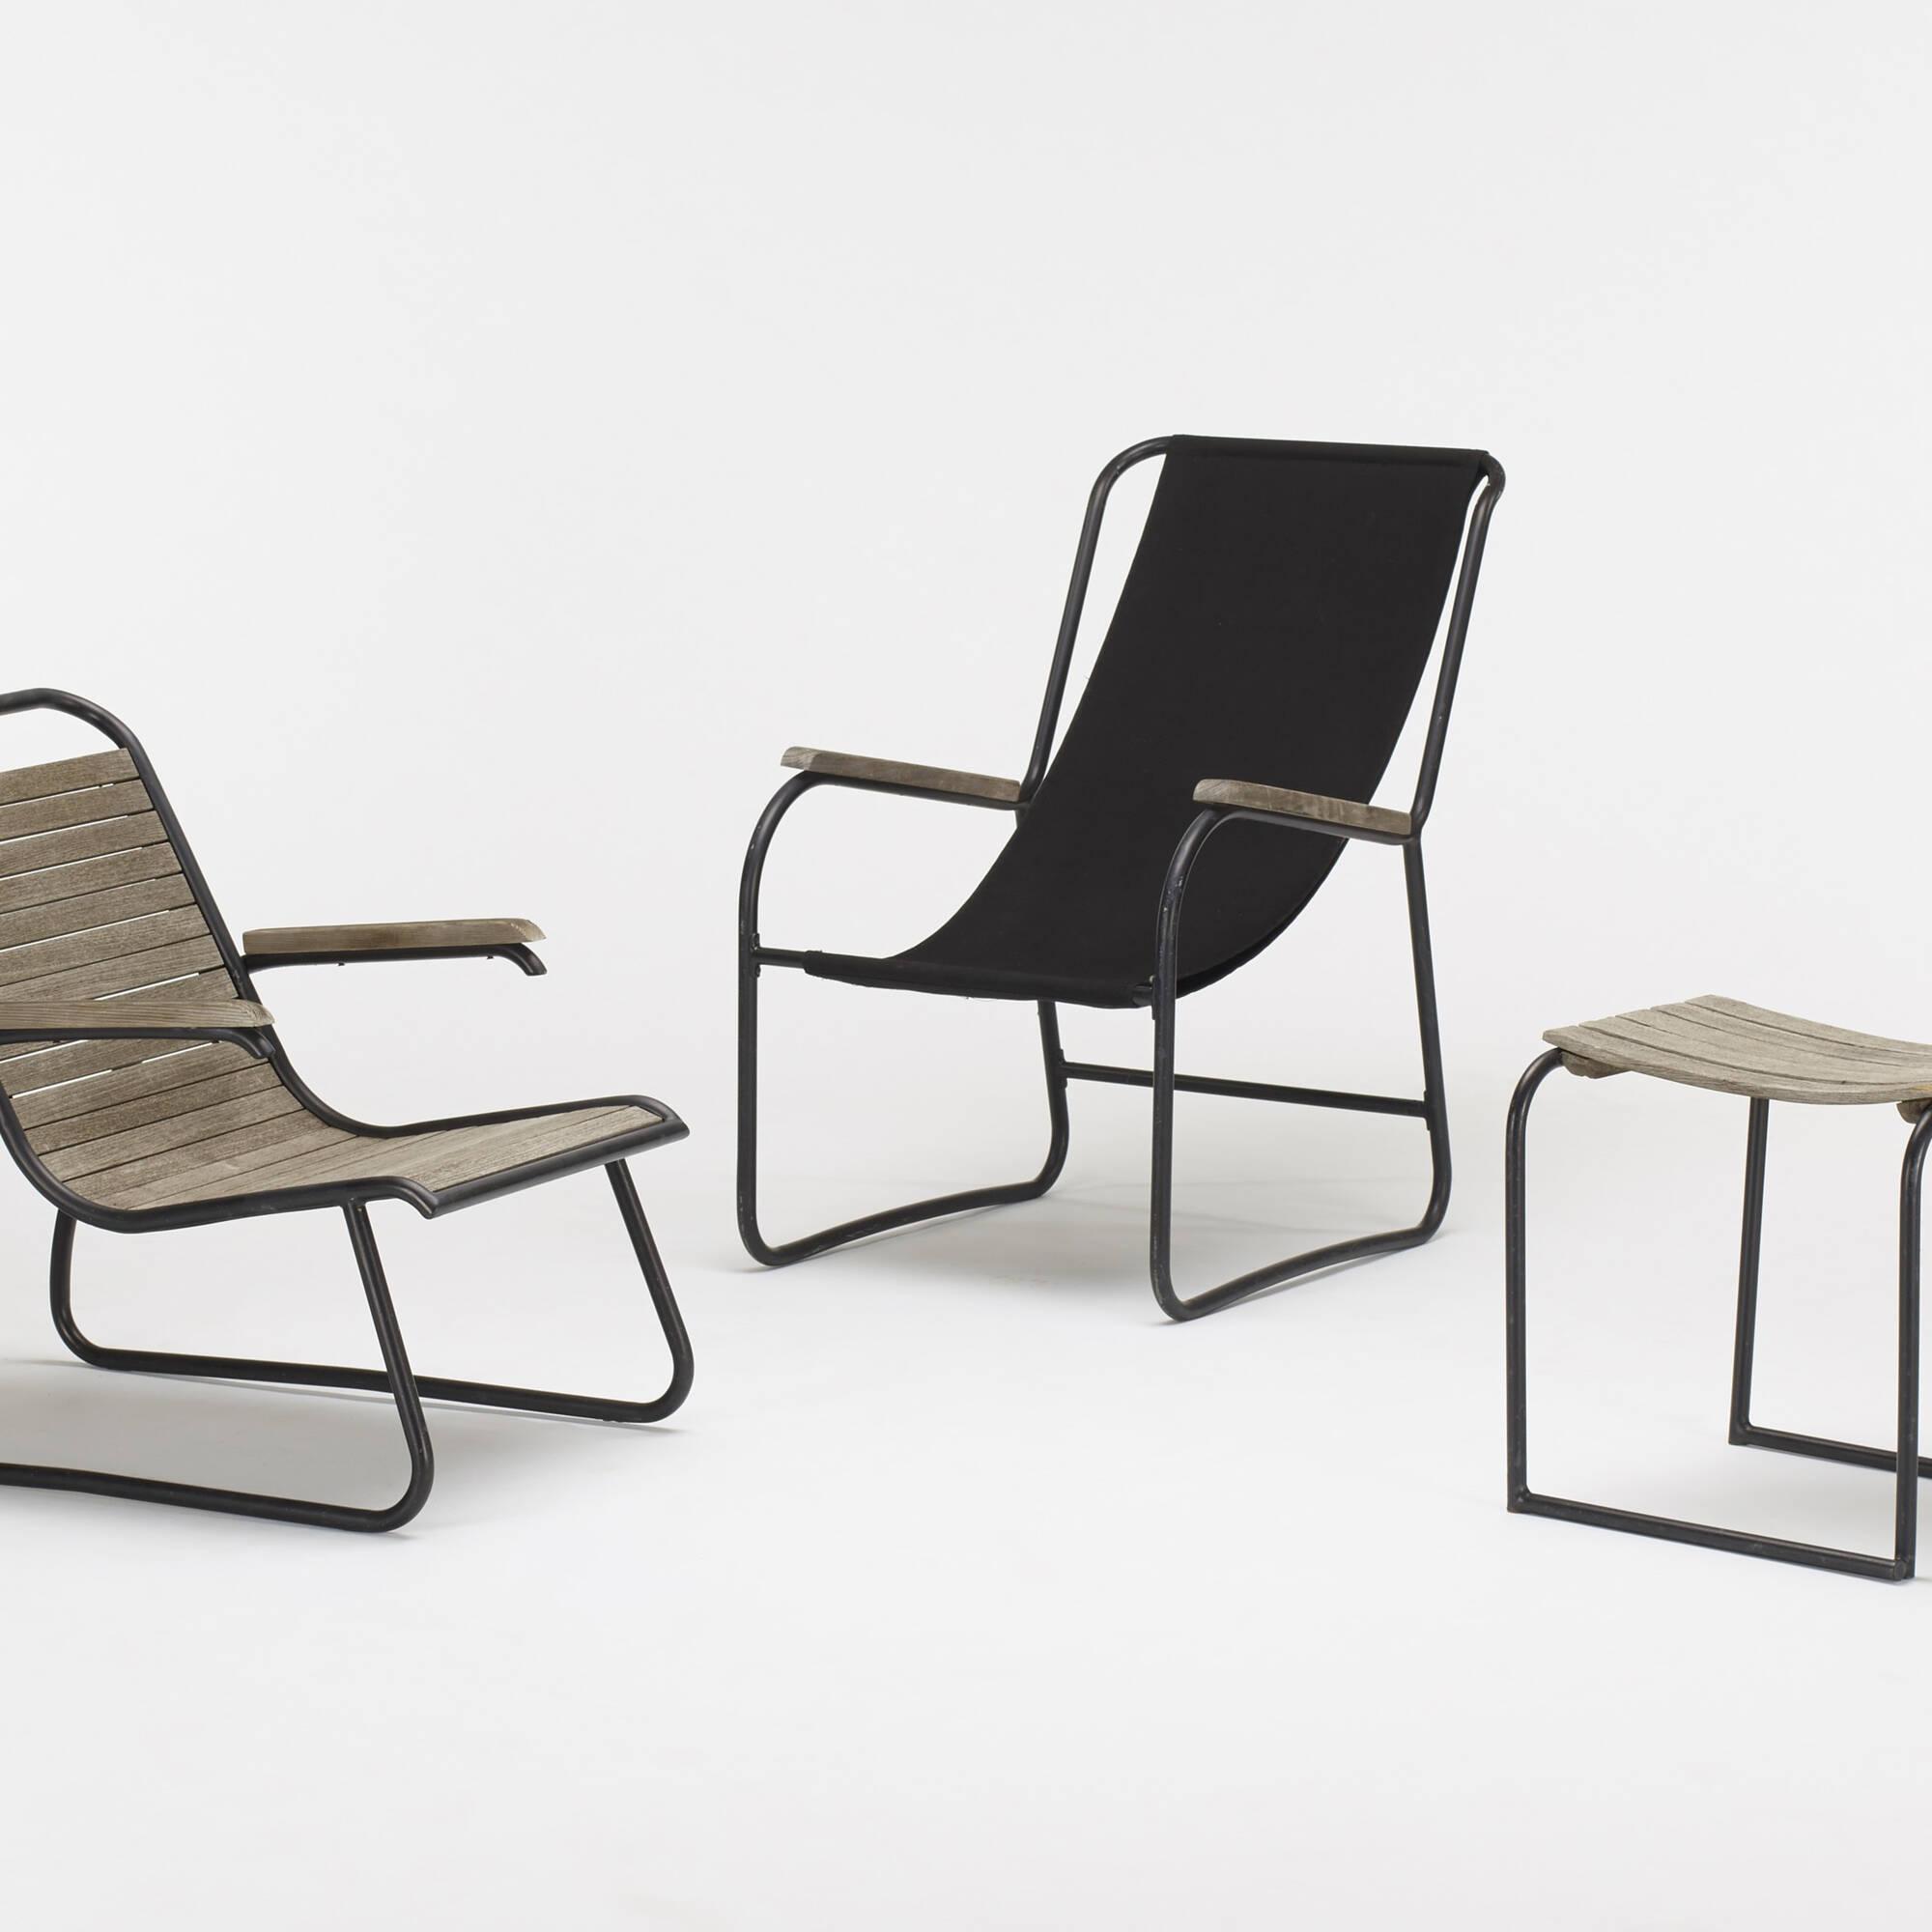 138 austrian suite of outdoor furniture u003c mass modern day 1 10 rh wright20 com